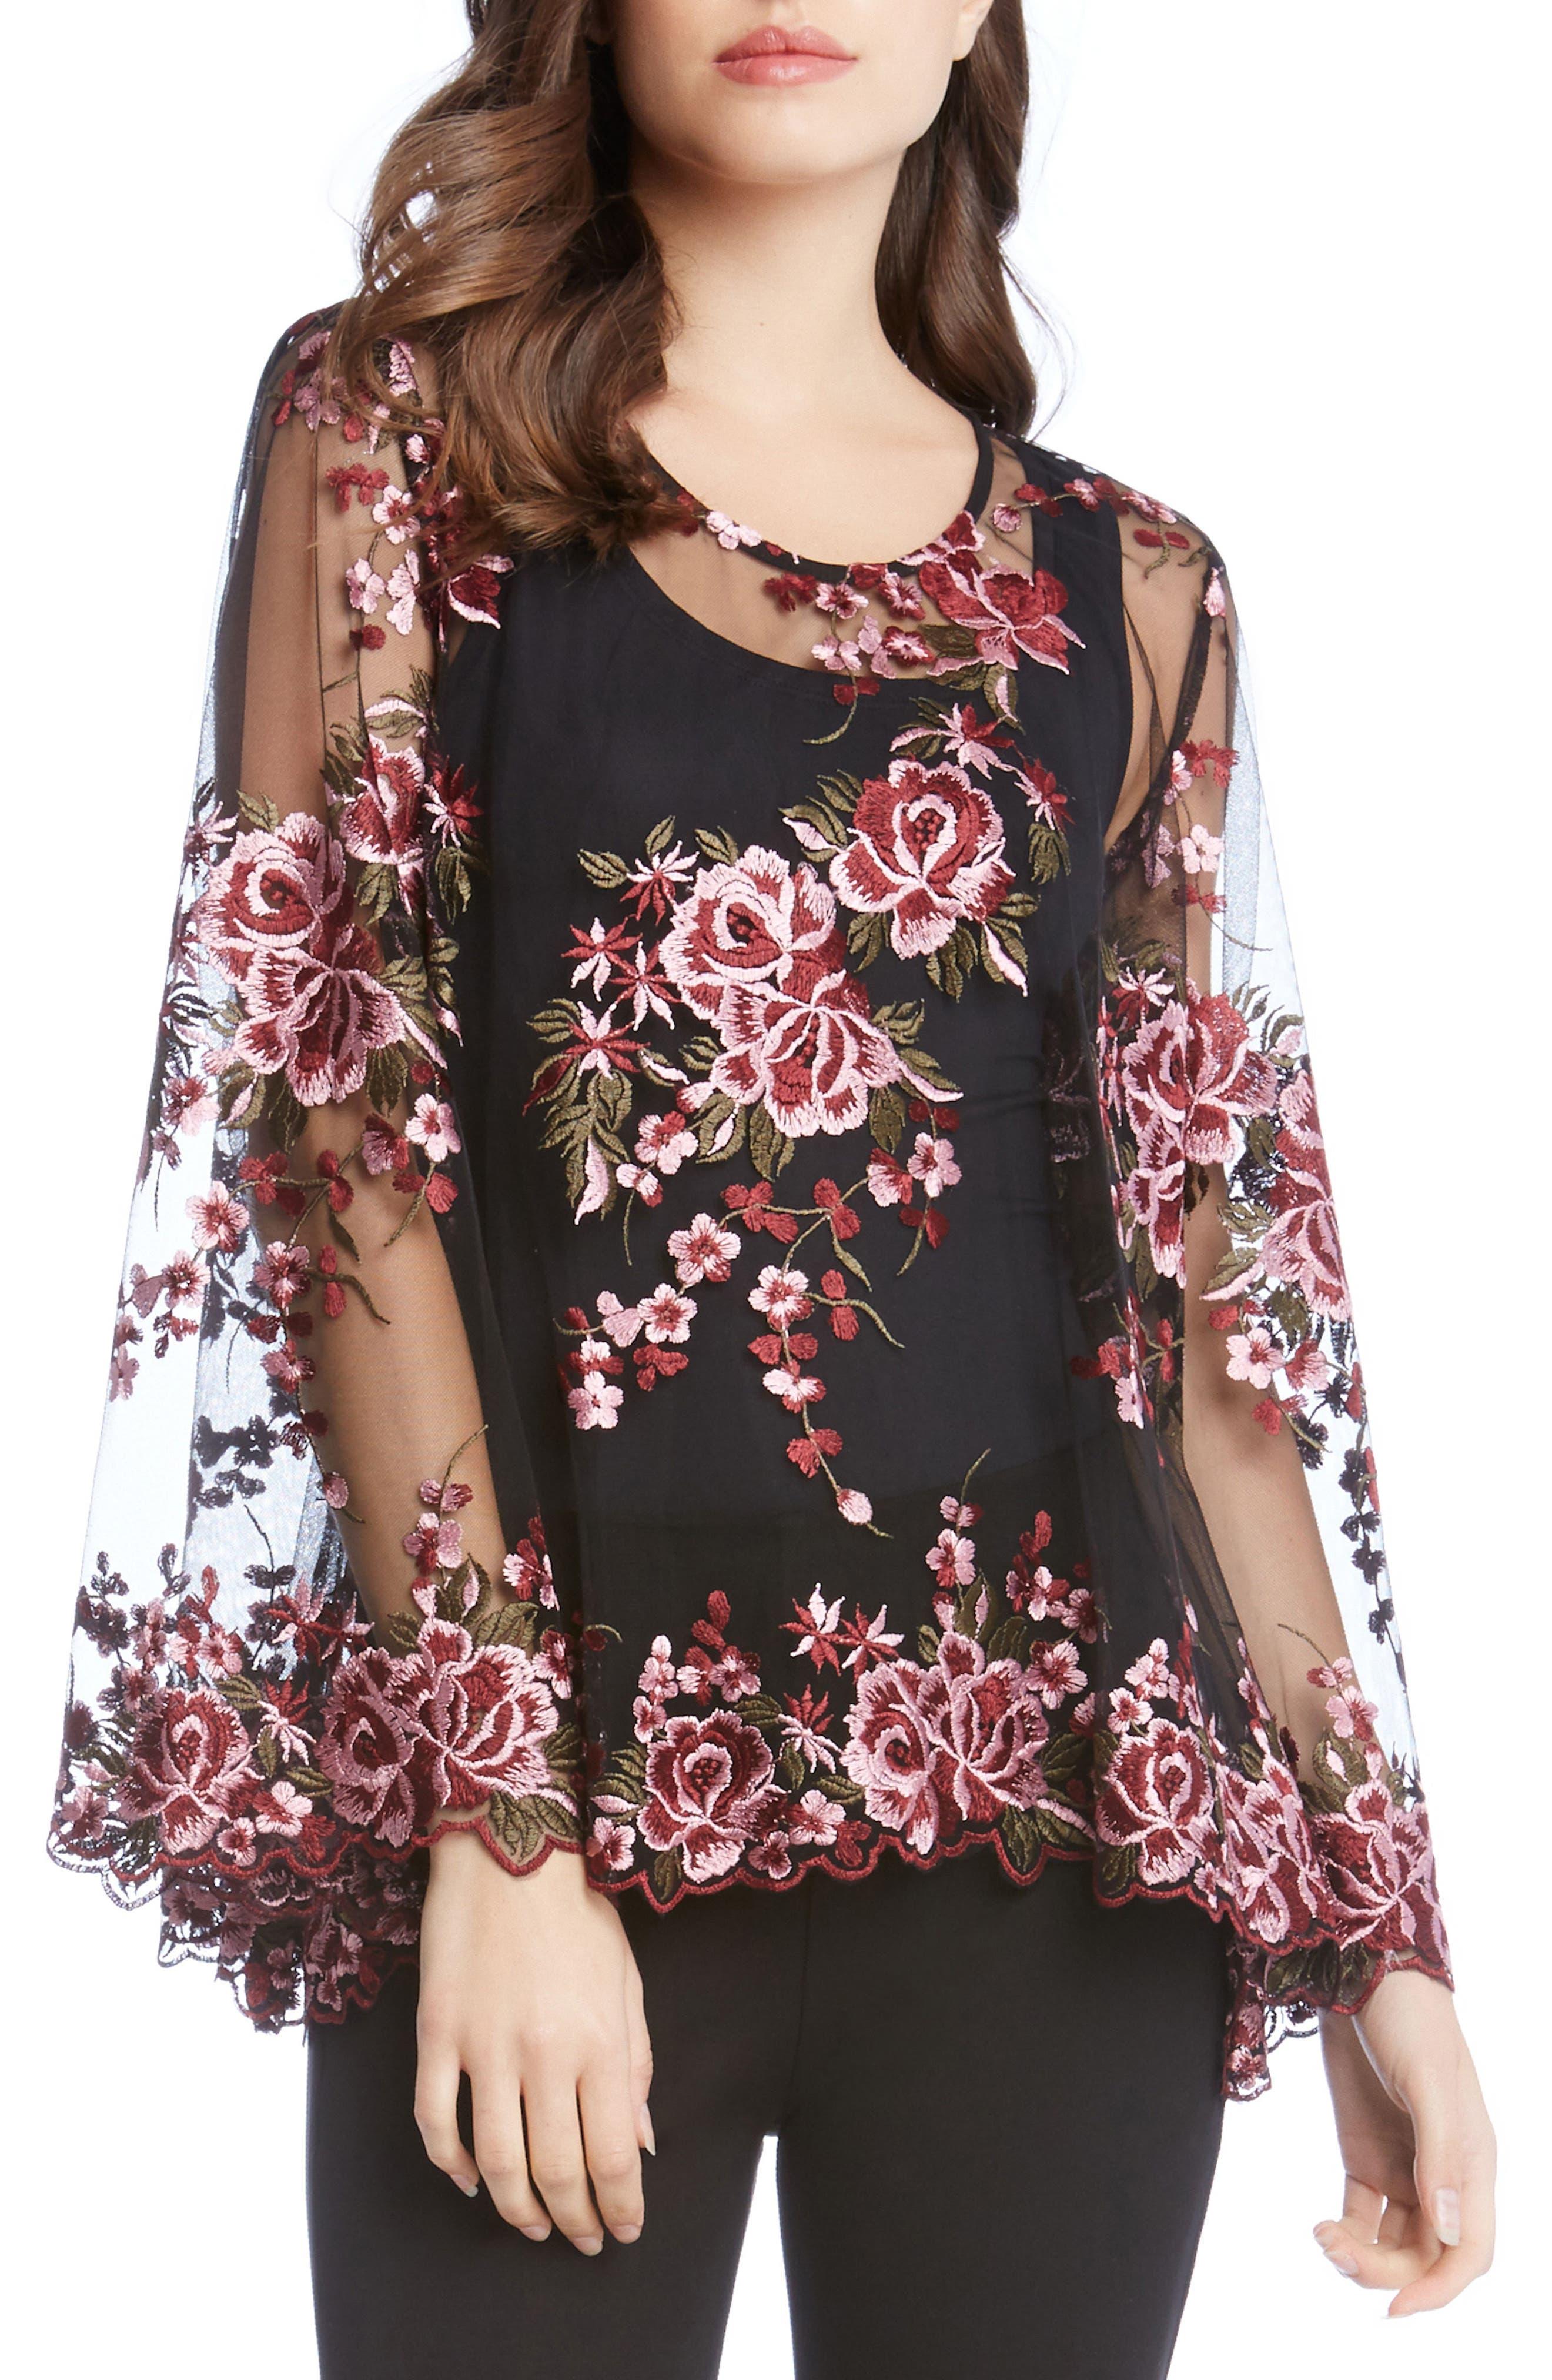 Alternate Image 1 Selected - Karen Kane Embroidered Bell Sleeve Top